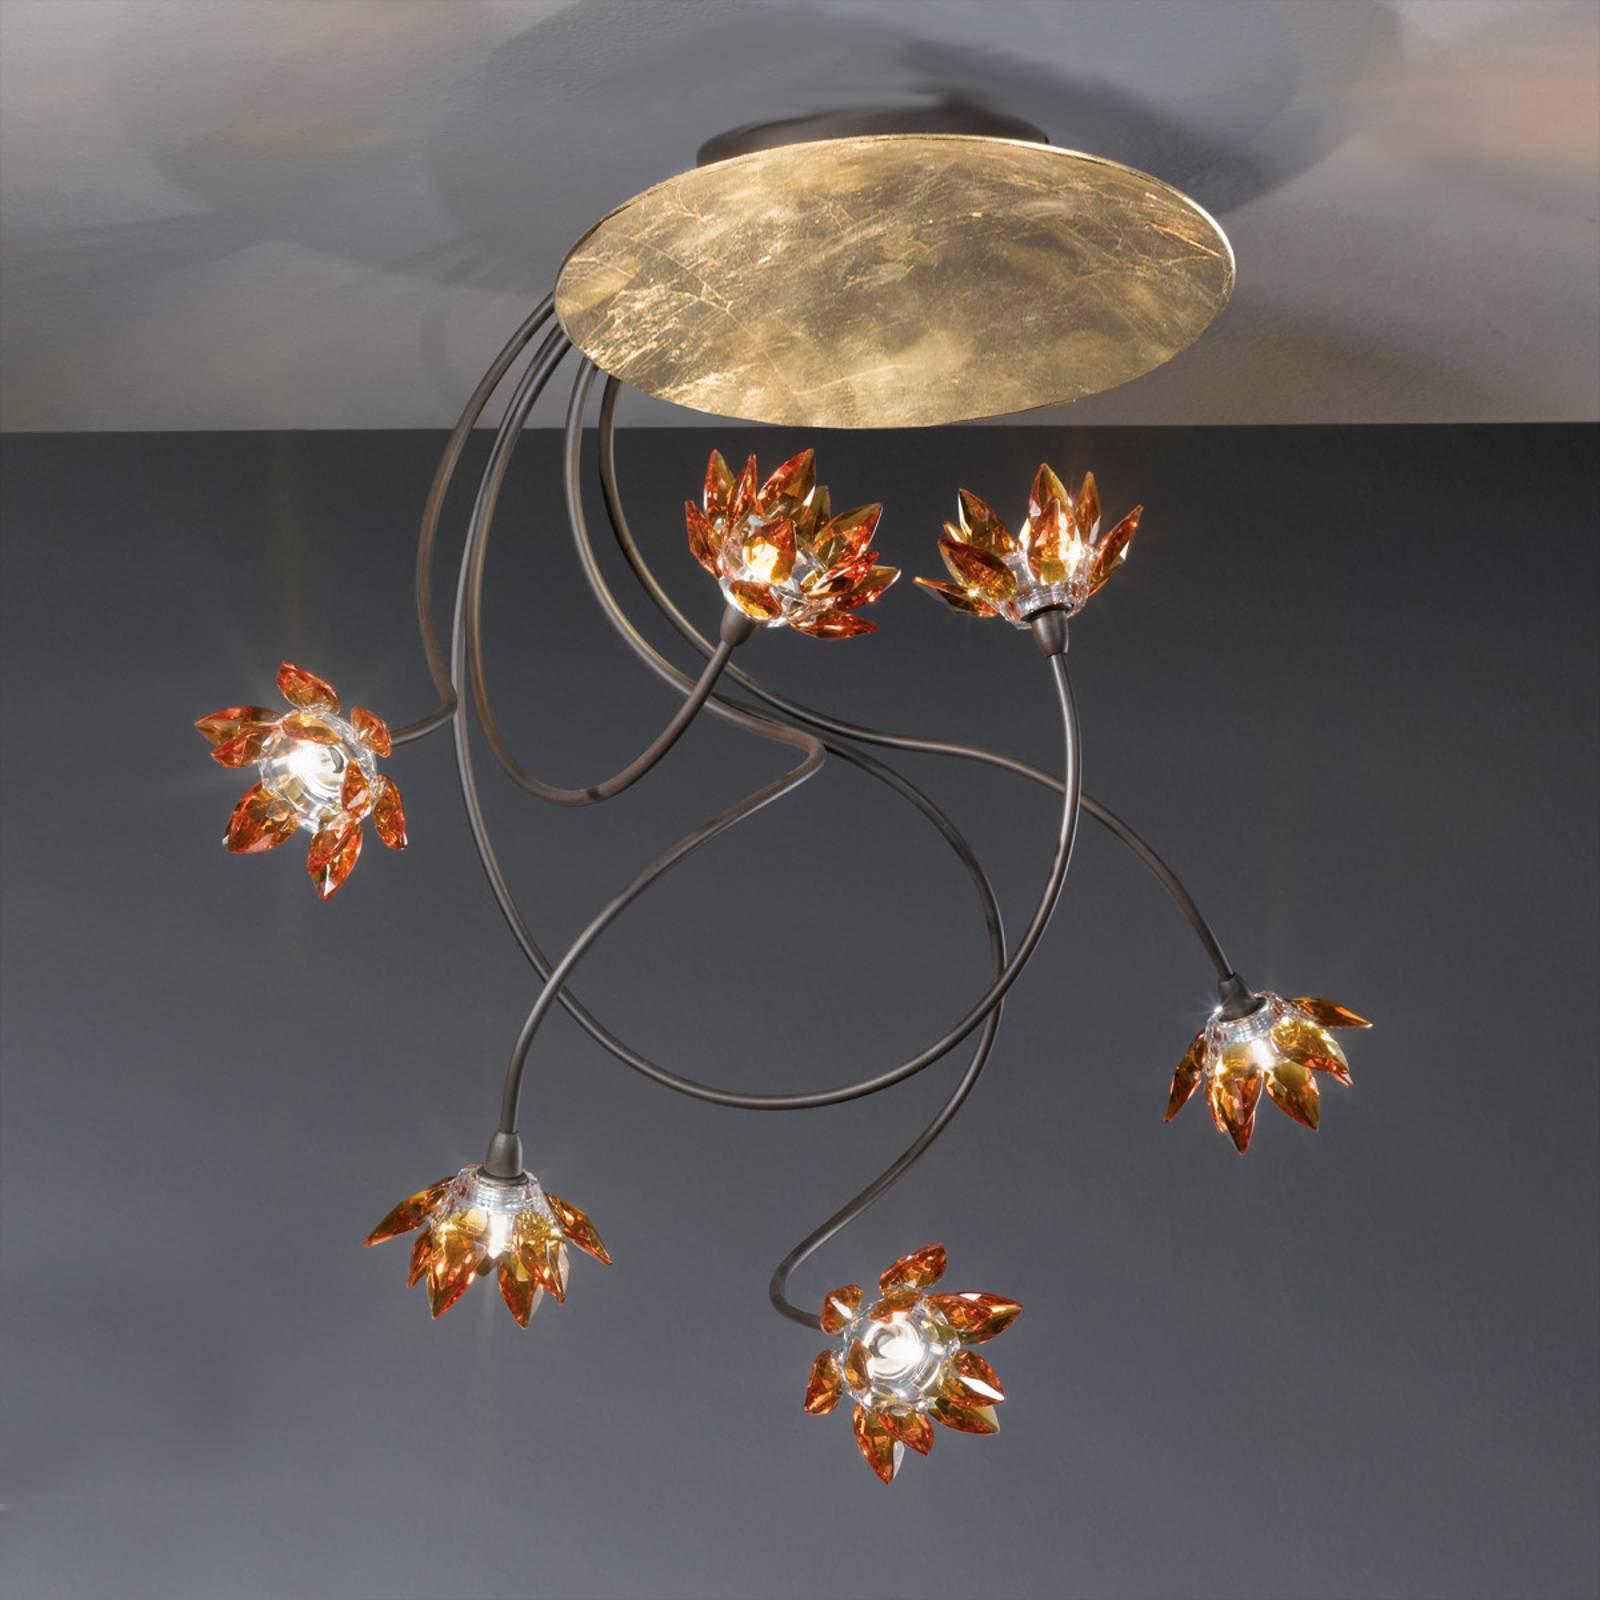 Blomstret FIORELLA taklampe med seks lys i ambra